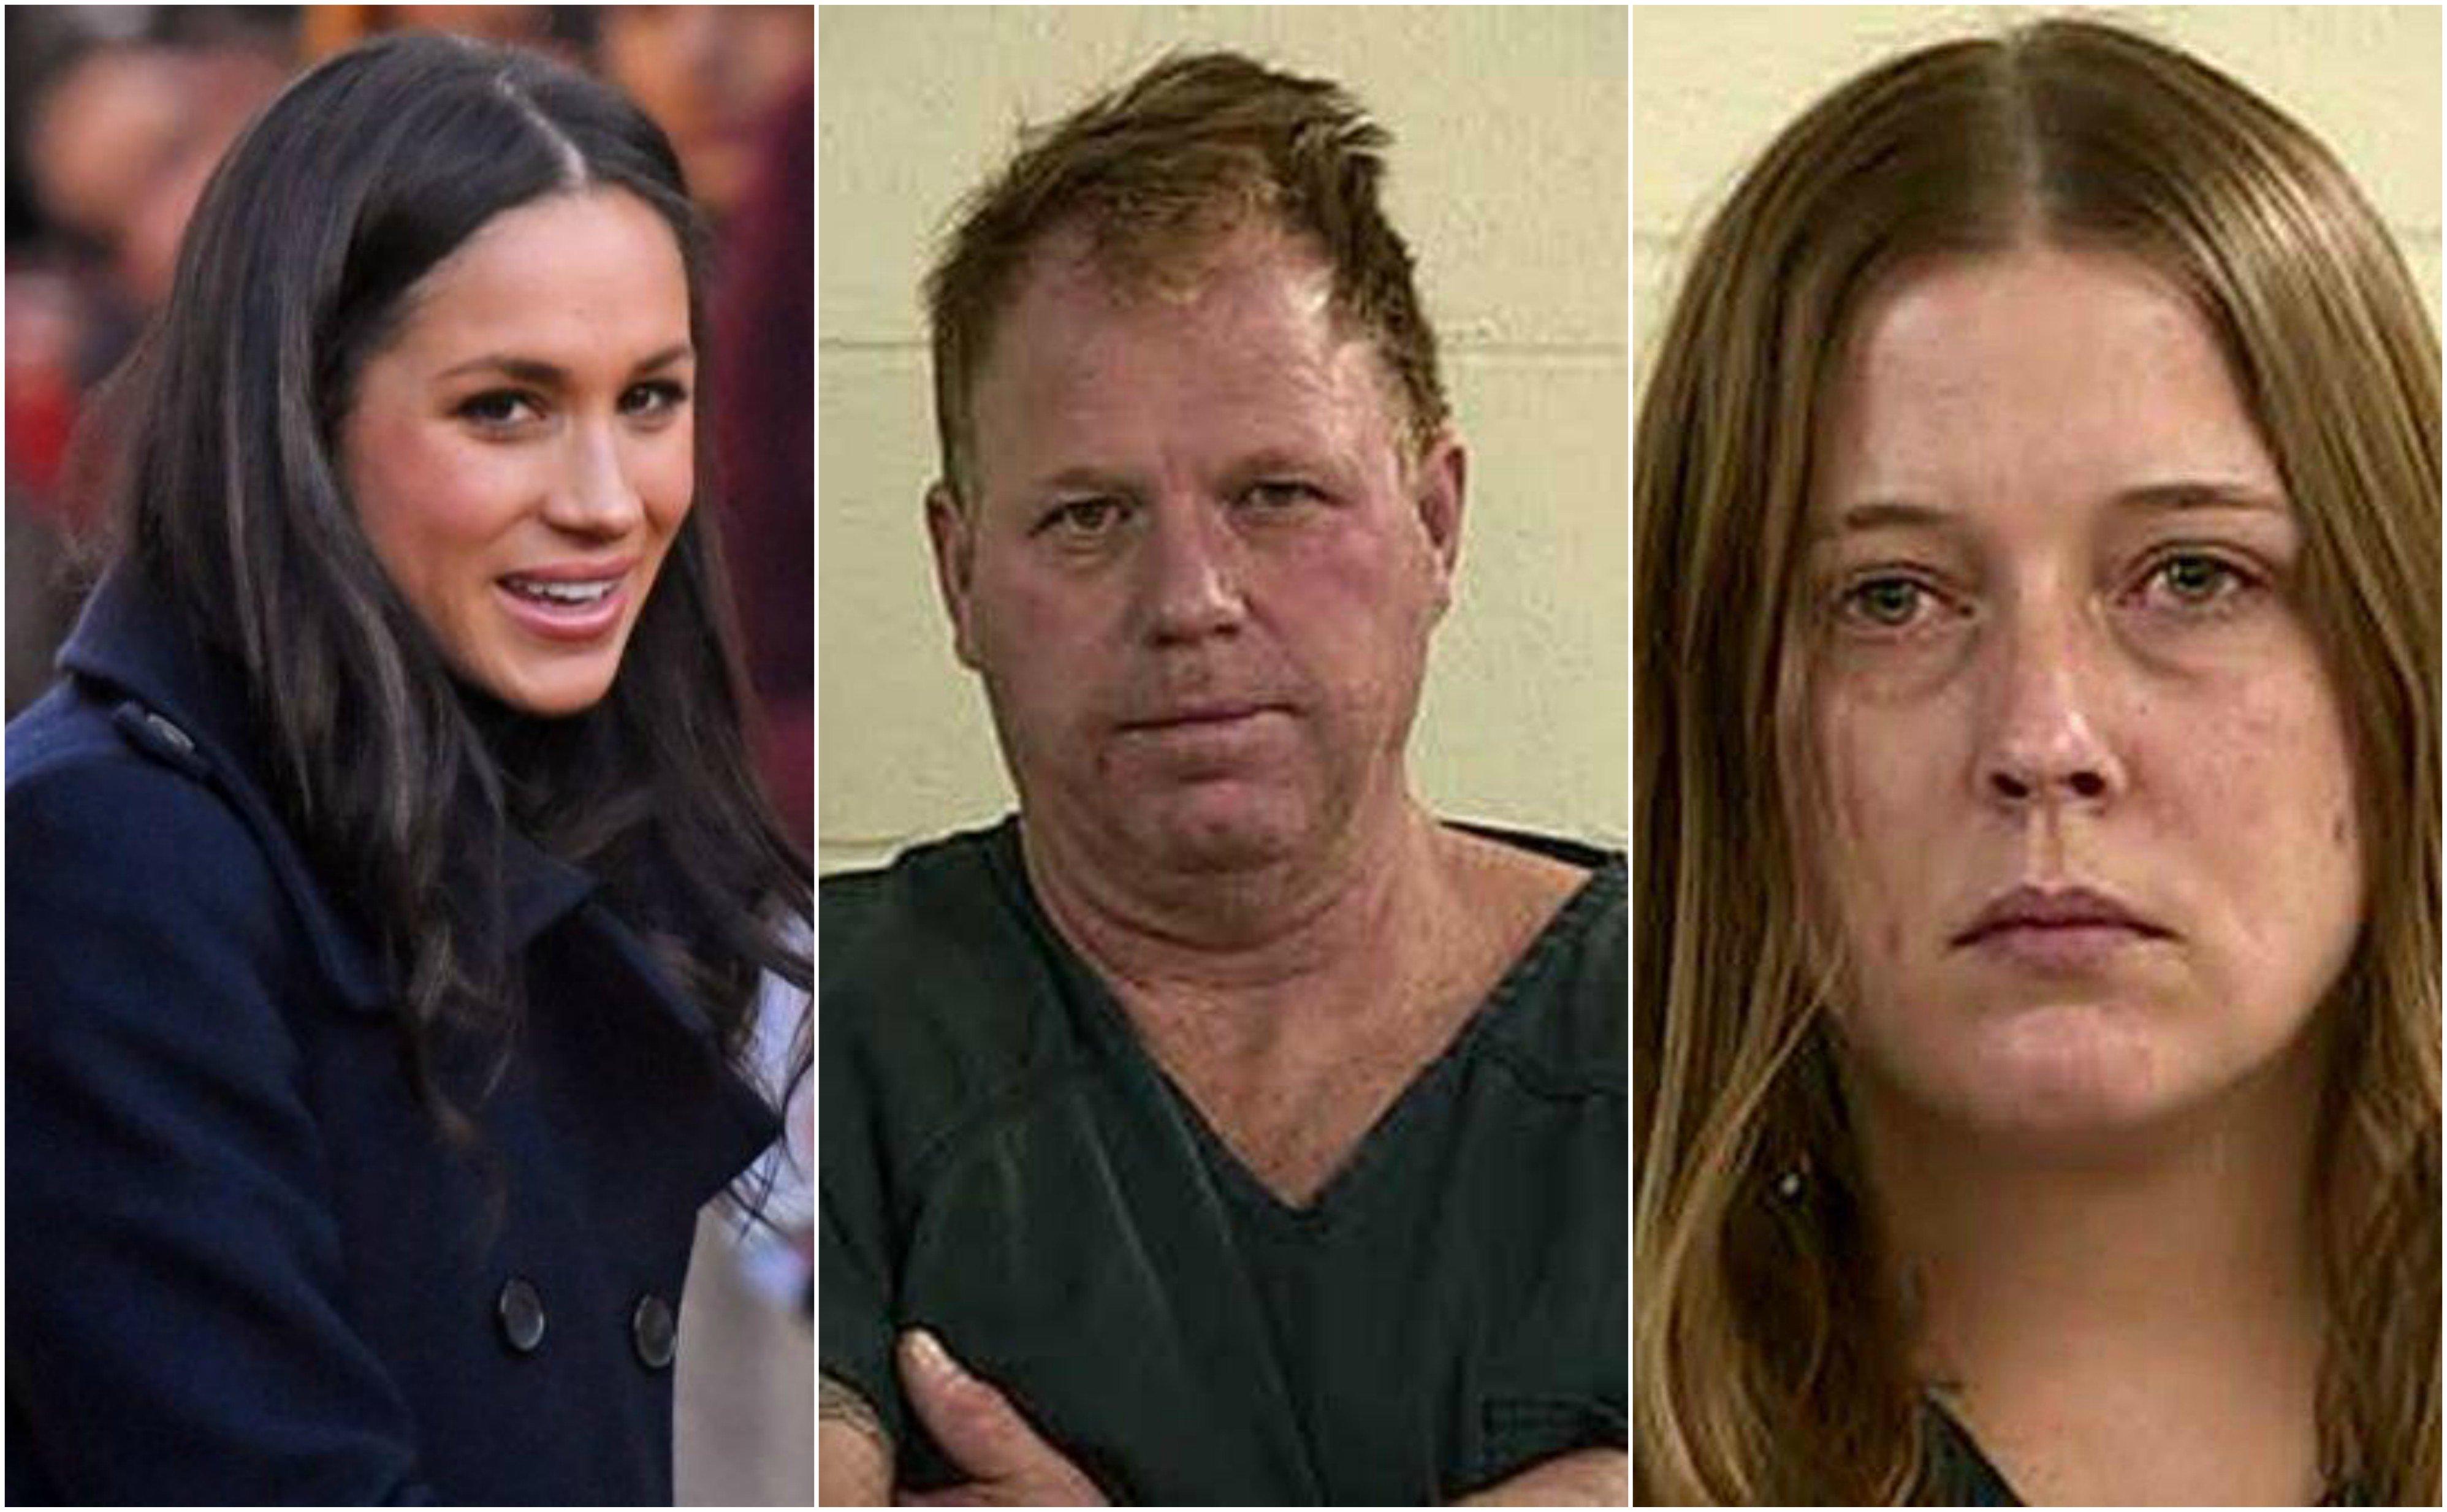 meghan markle thomas markle jr e darlene blount.jpg?resize=1200,630 - A cunhada de Meghan Markle foi presa por violência doméstica!